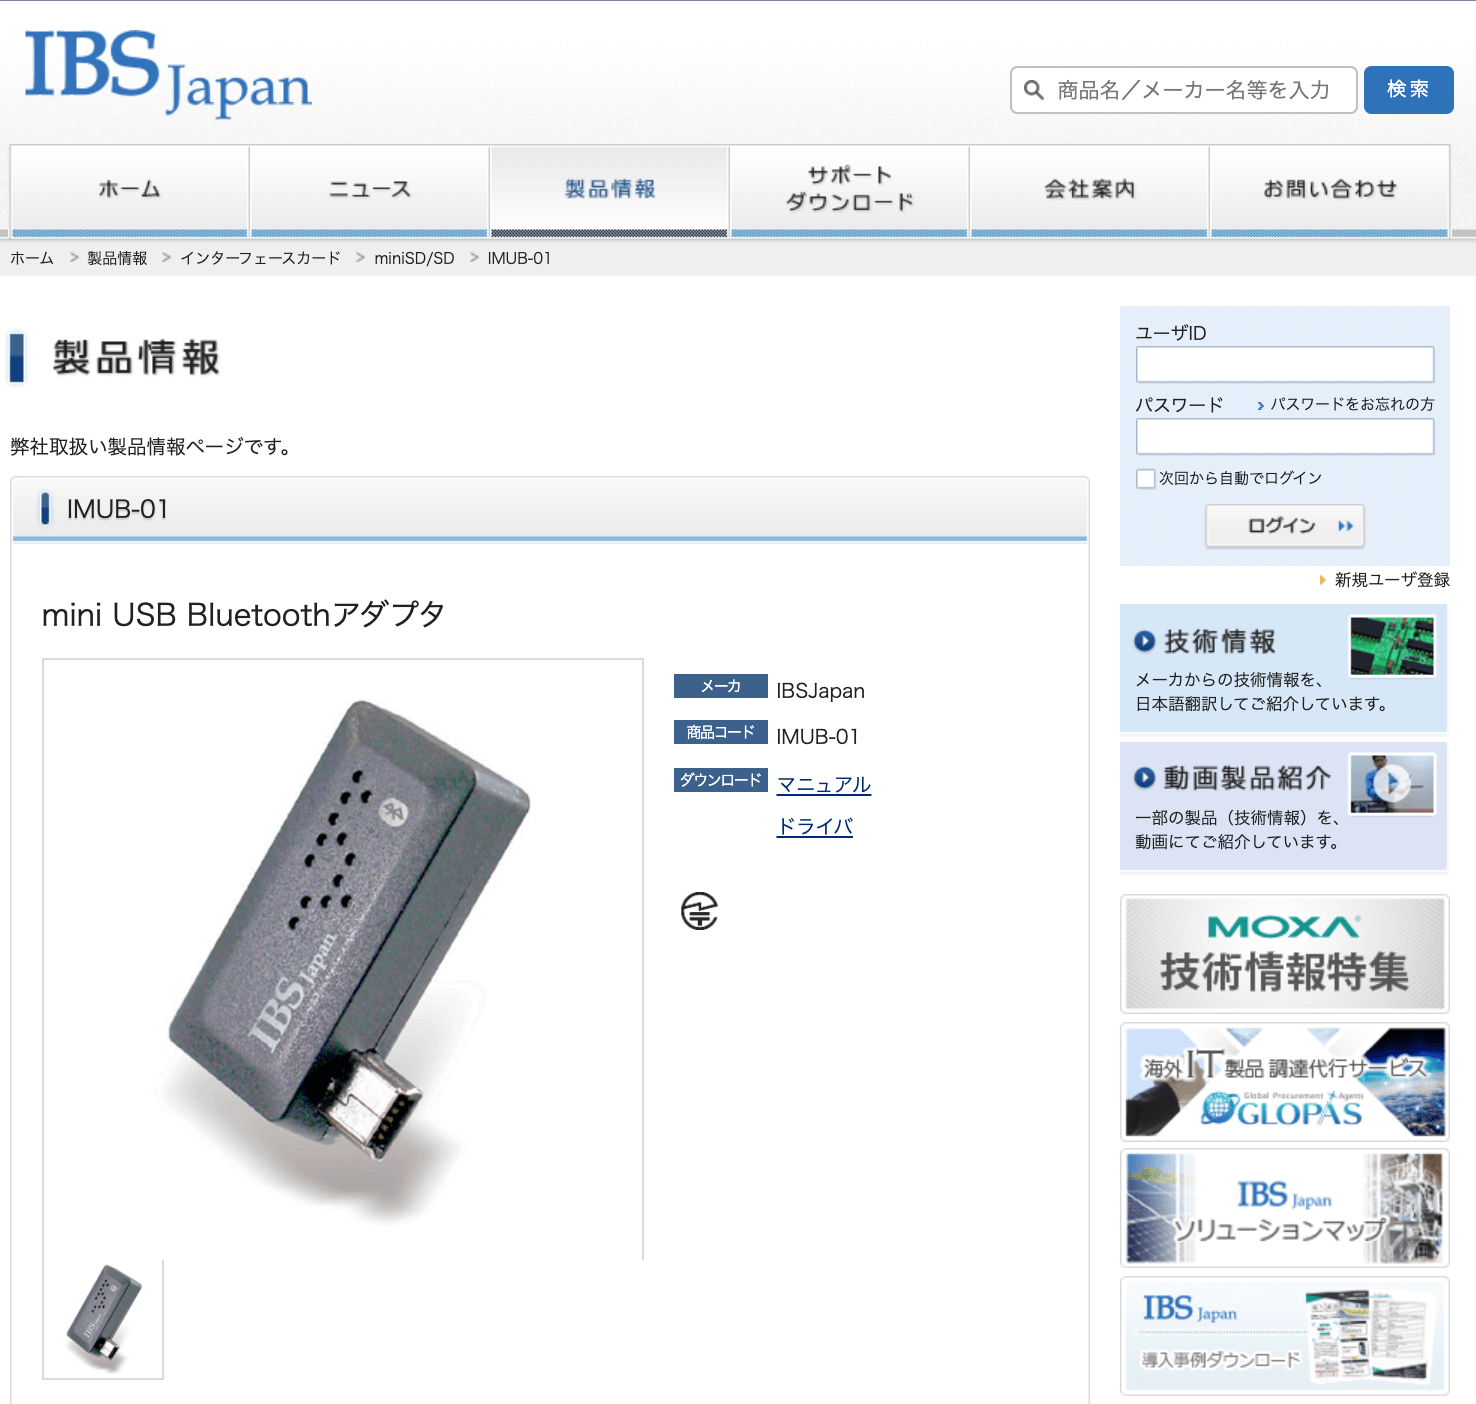 mini USB Bluetoothアダプタ